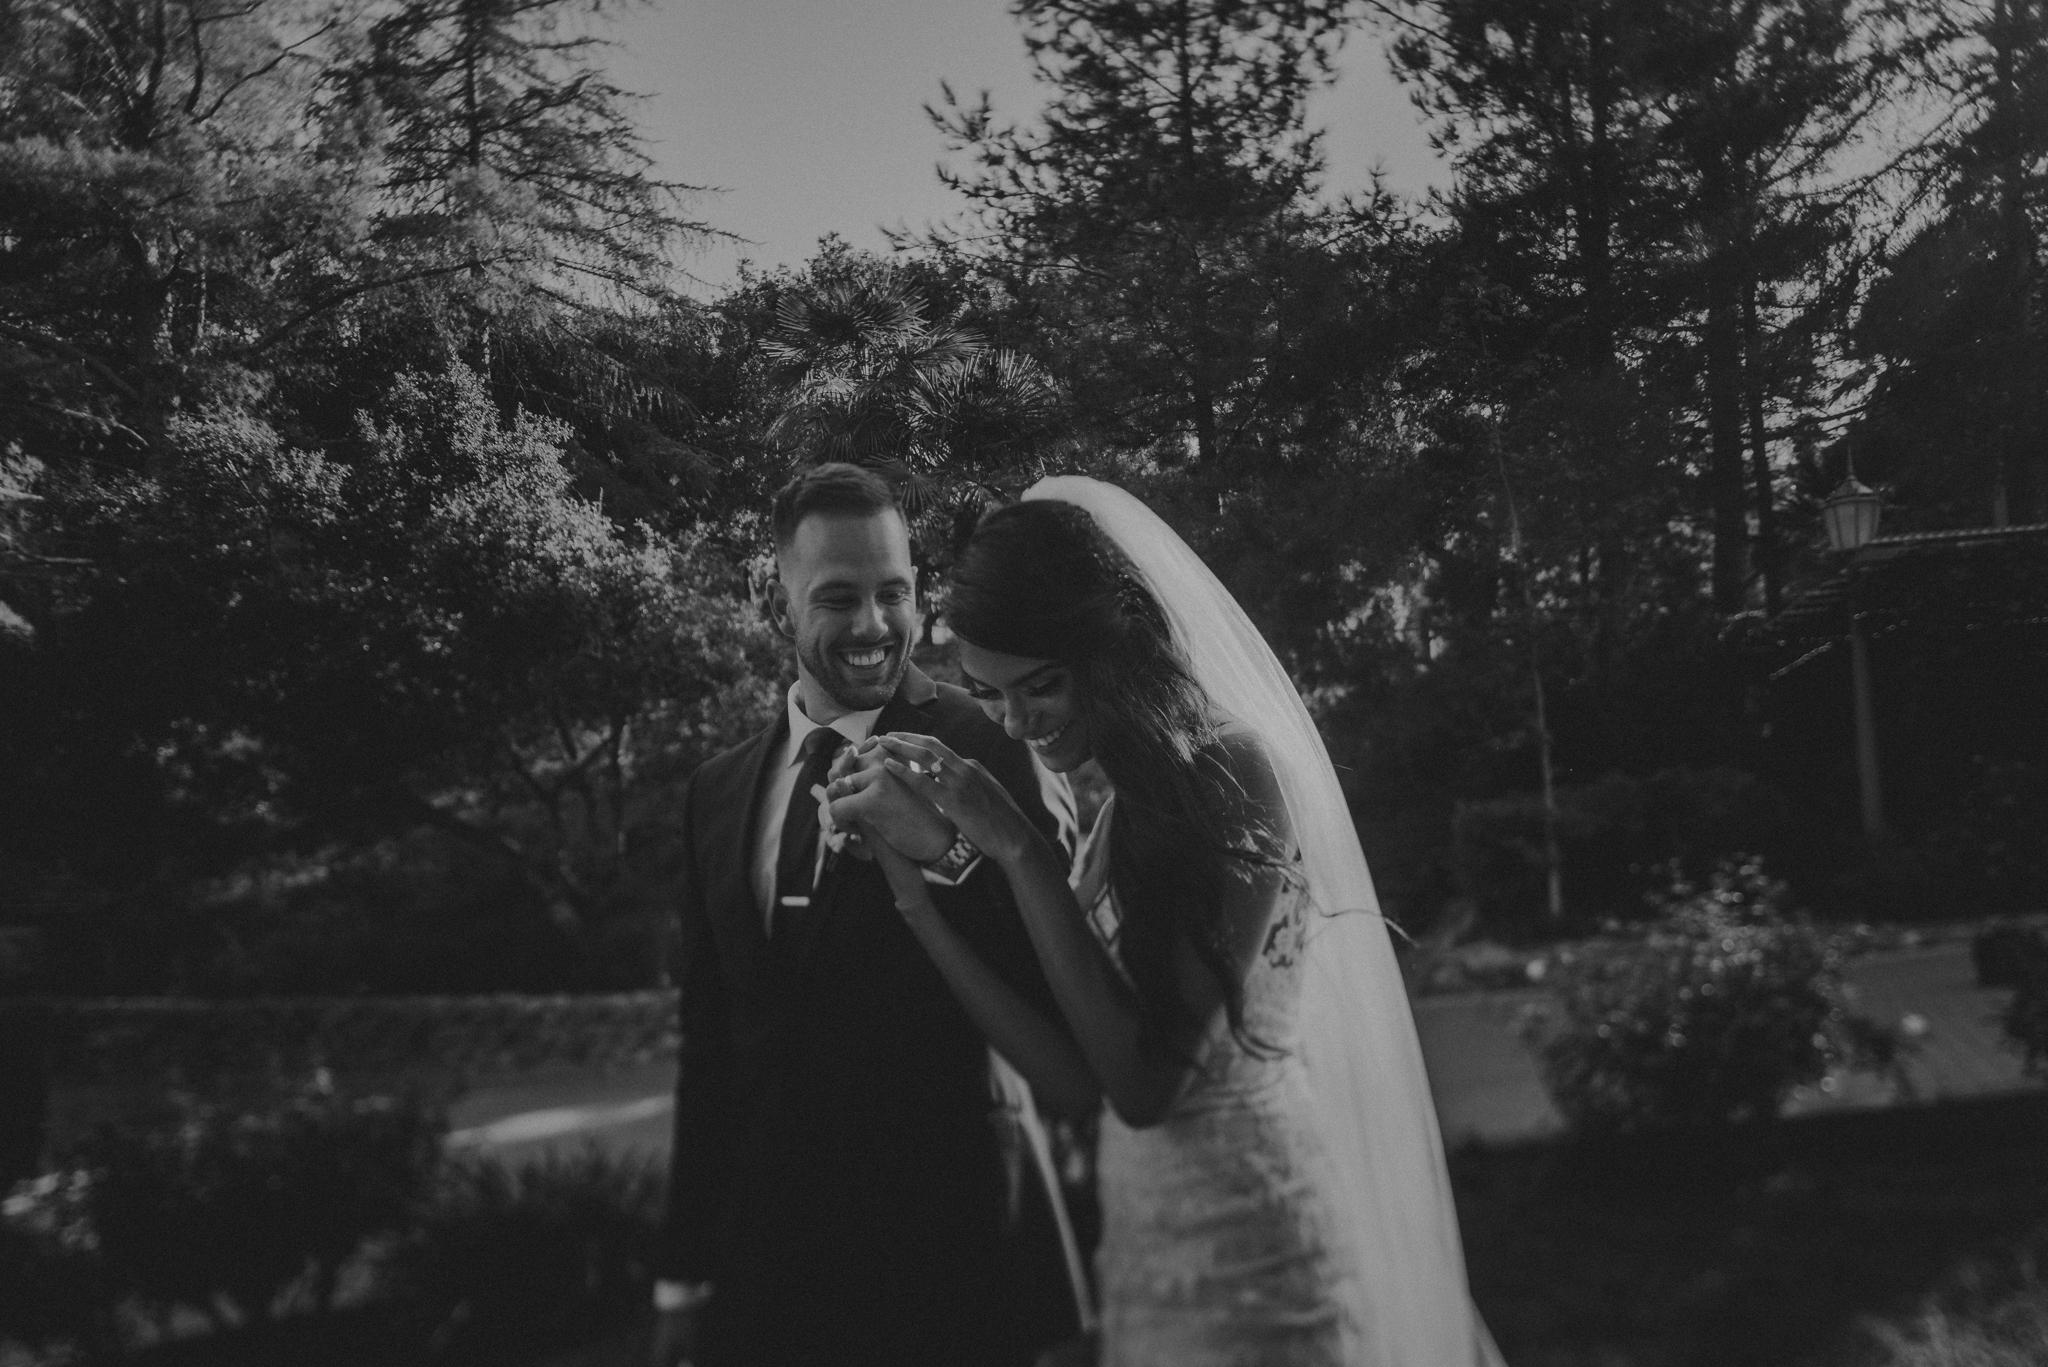 Isaiah + Taylor Photography - Rancho Las Lomas Wedding, Los Angeles Wedding Photographer-095.jpg